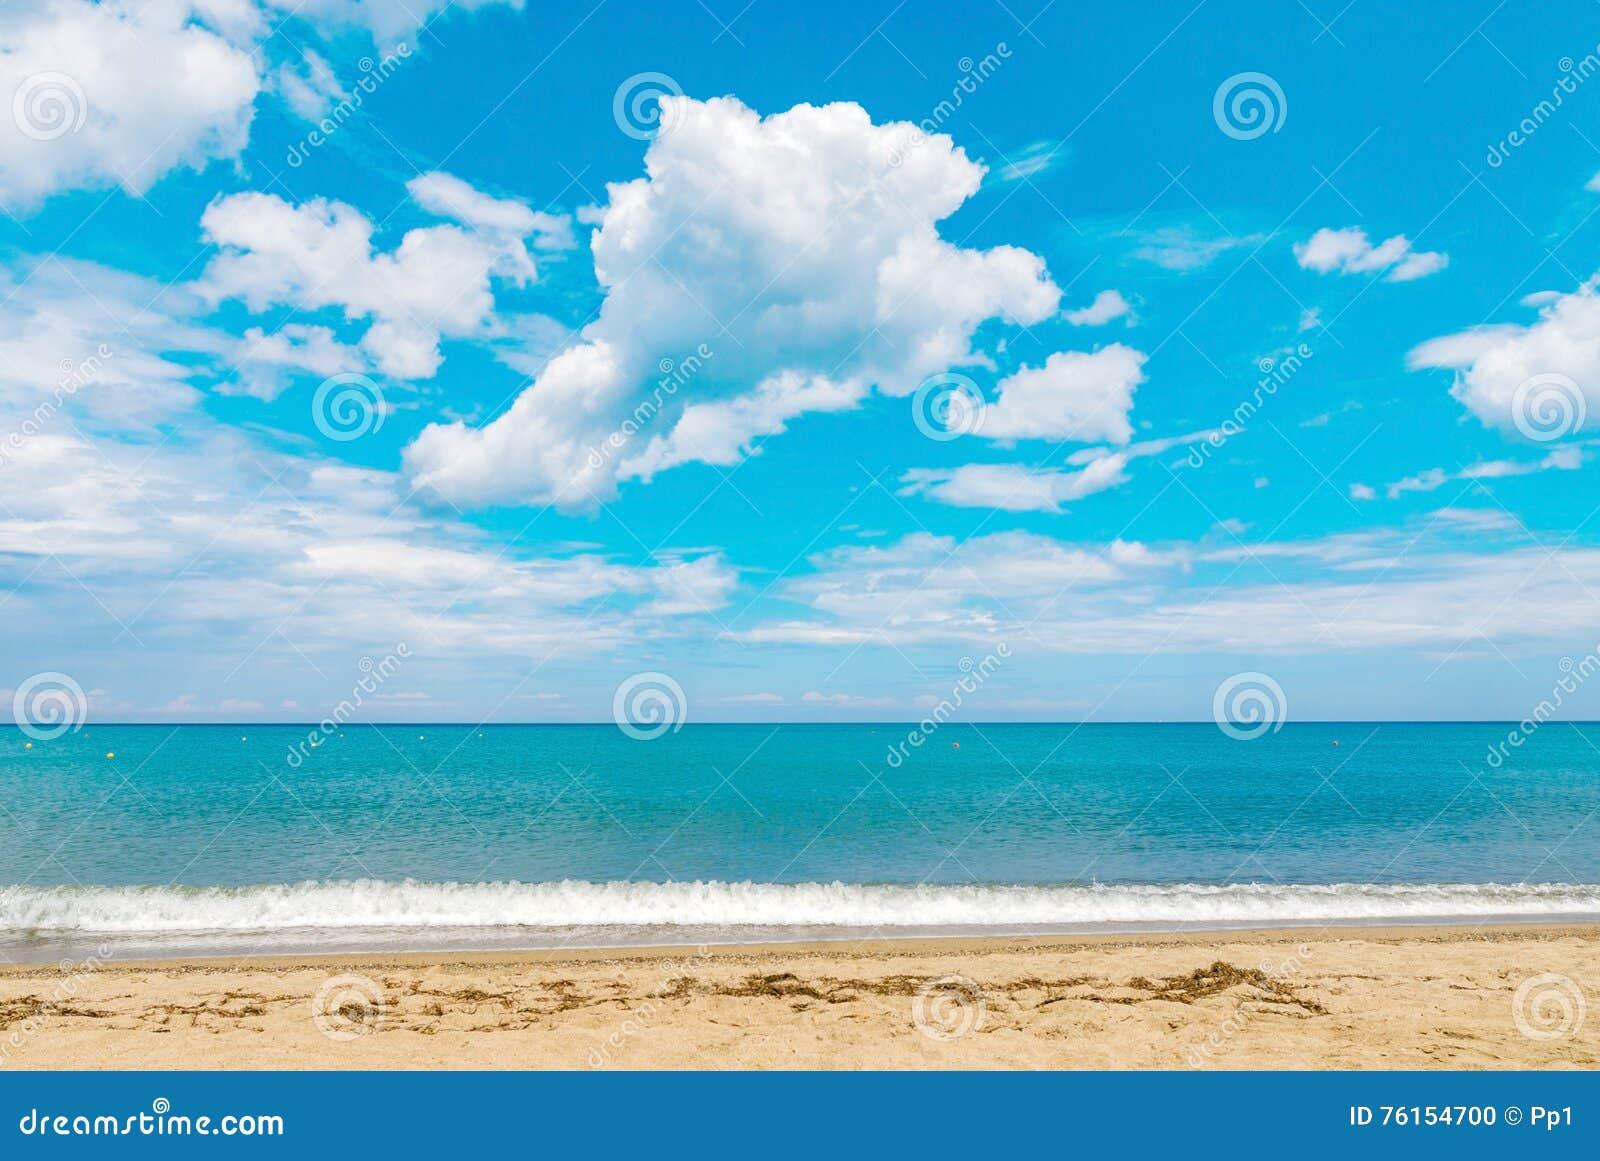 Tropical Island Sun: Beach Sea Ocean Sand Blue Water Tropical Island Stock